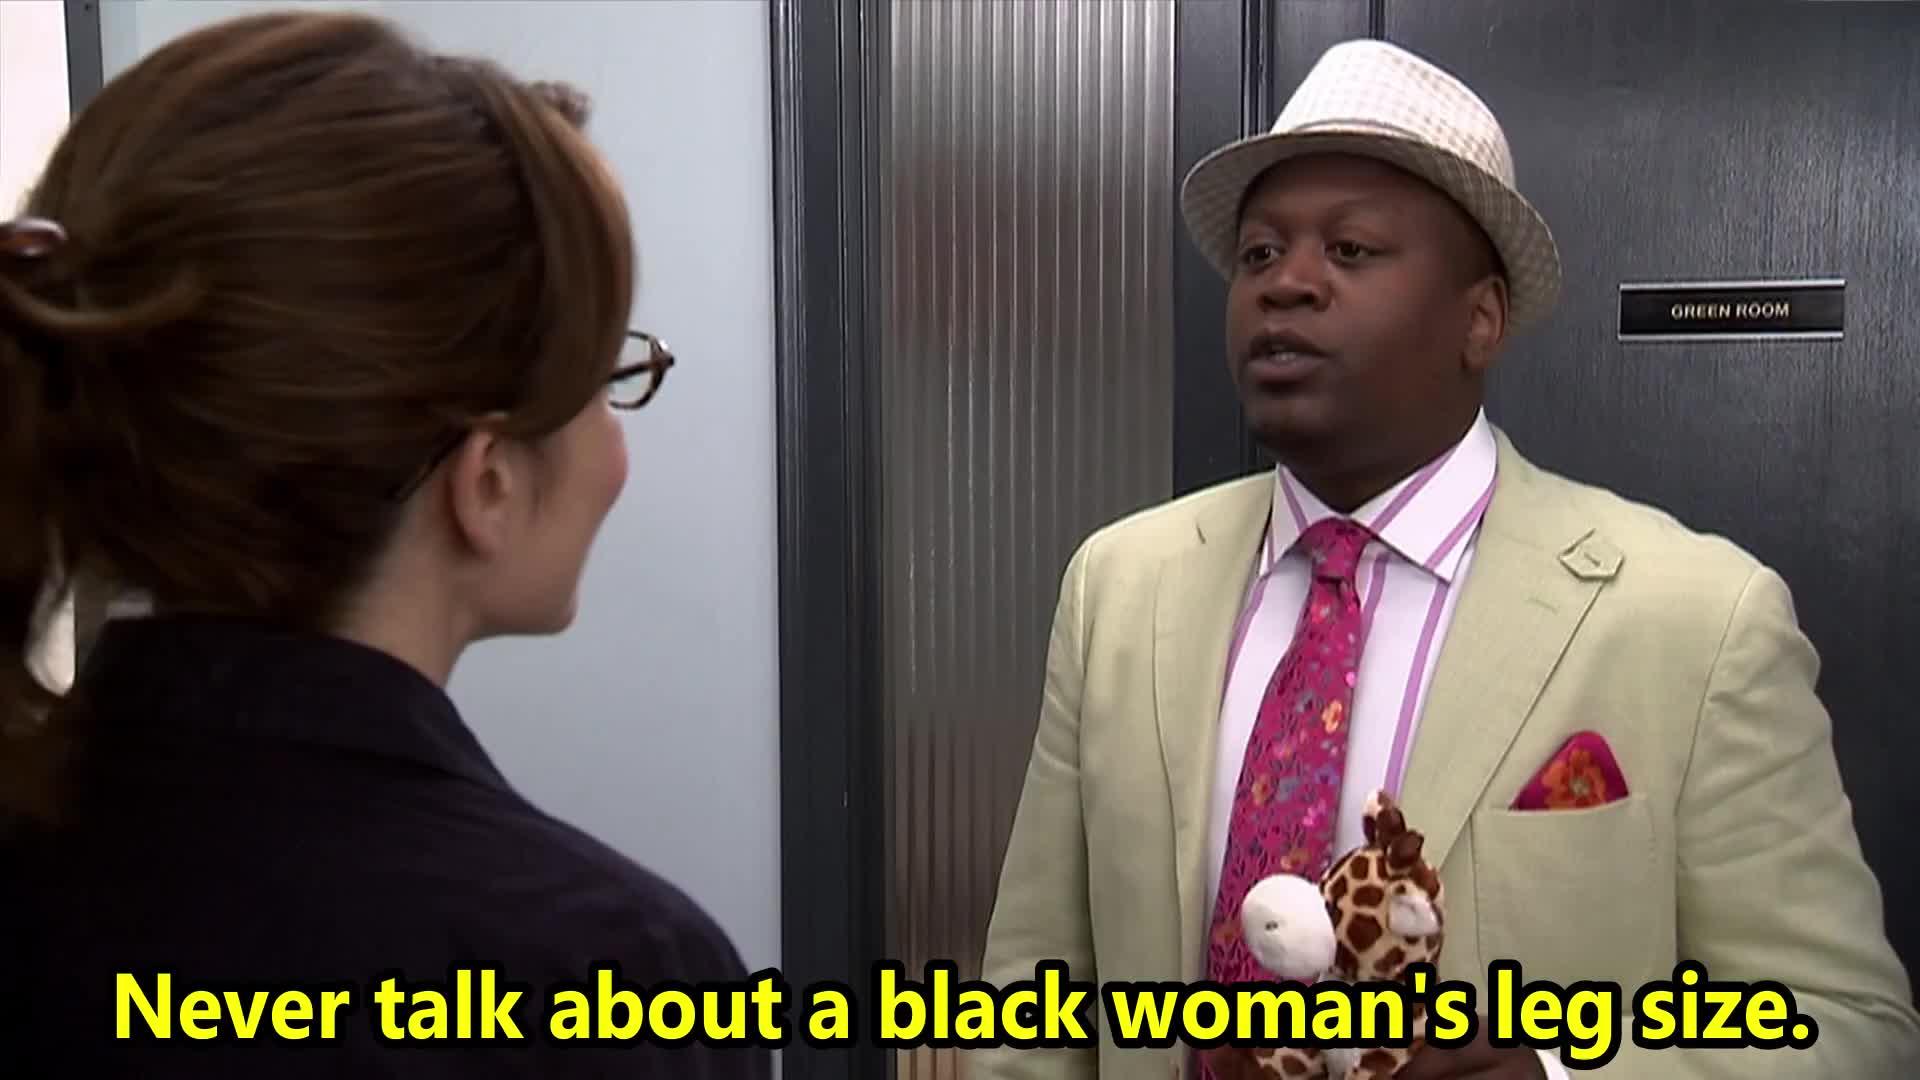 30 ROCK, D'Fwan, Jordan, Queen, S06E20, black, celebs, leg, of, size, talk, tina fey, tituss burgess, woman, Never talk about a black woman's leg size GIFs